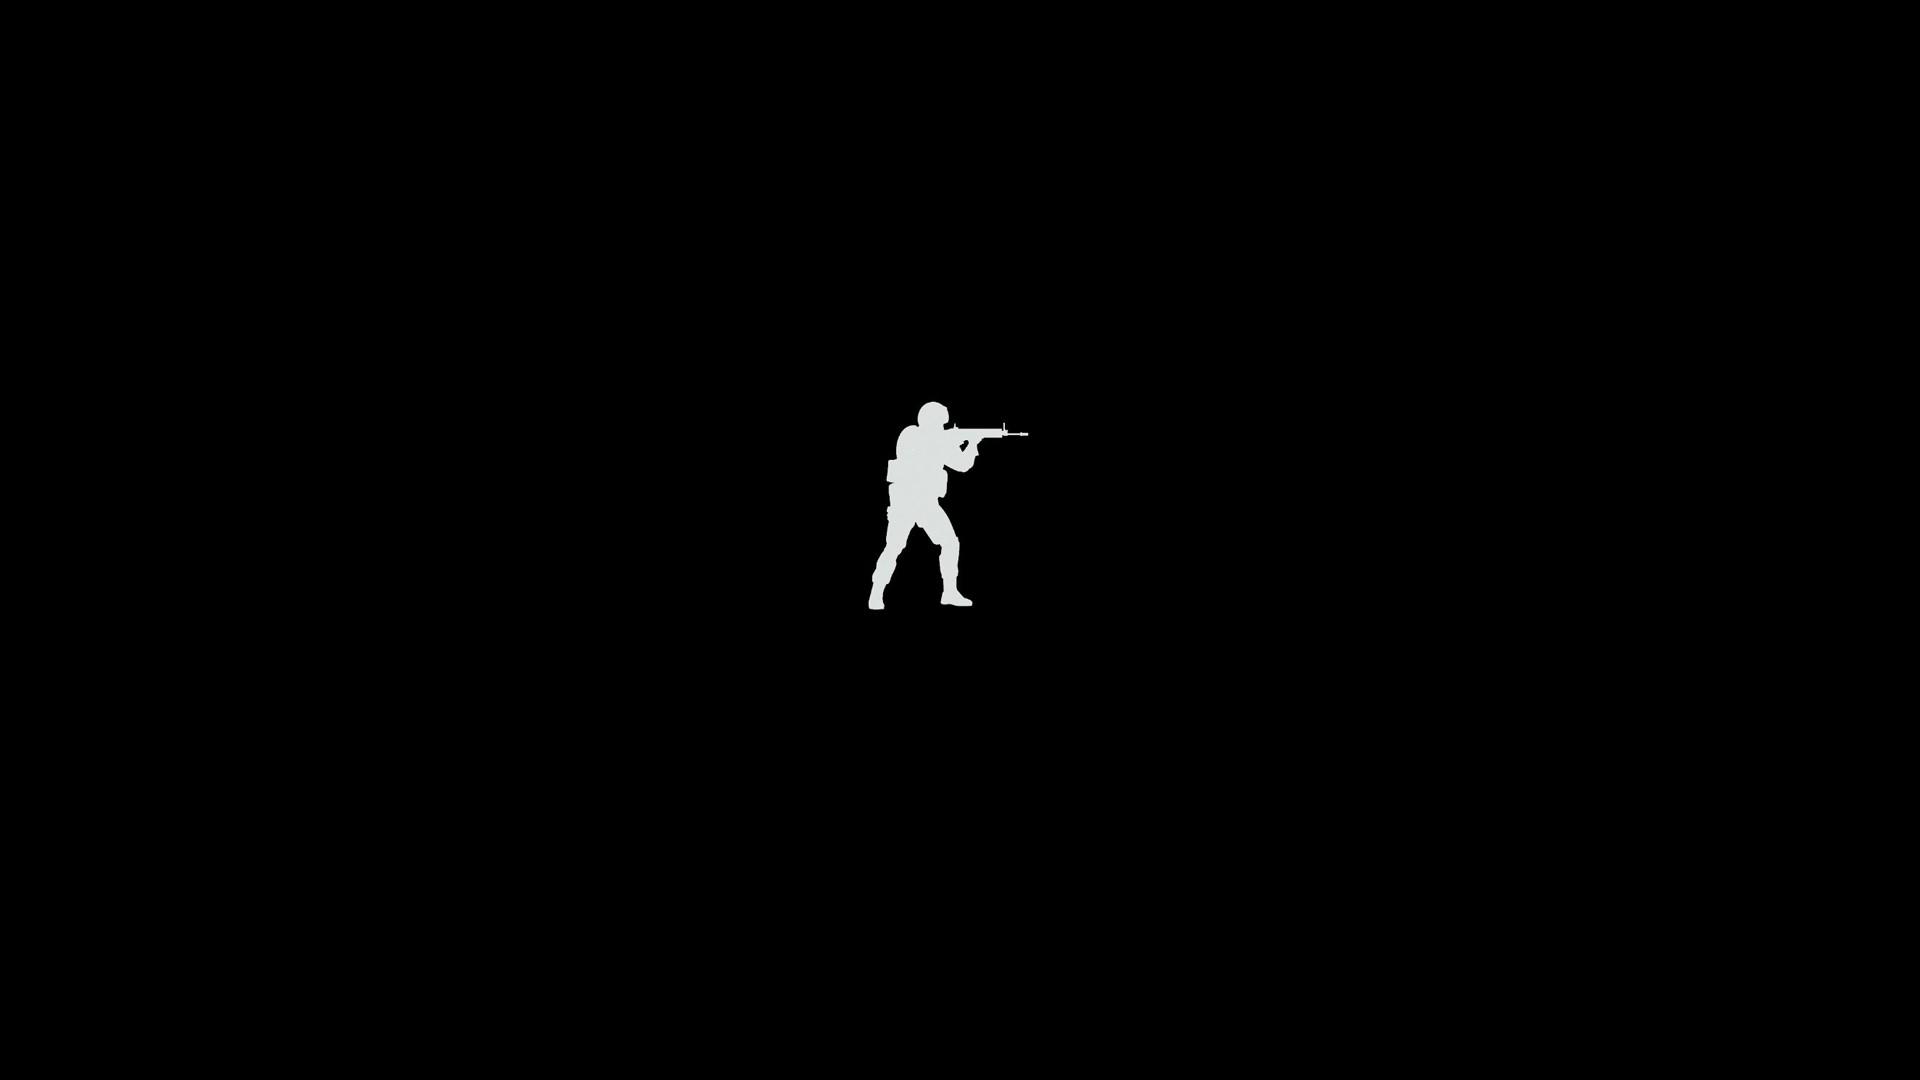 Dota 1 Heroes Wallpaper Hd Minimalism Video Games Counter Strike Global Offensive